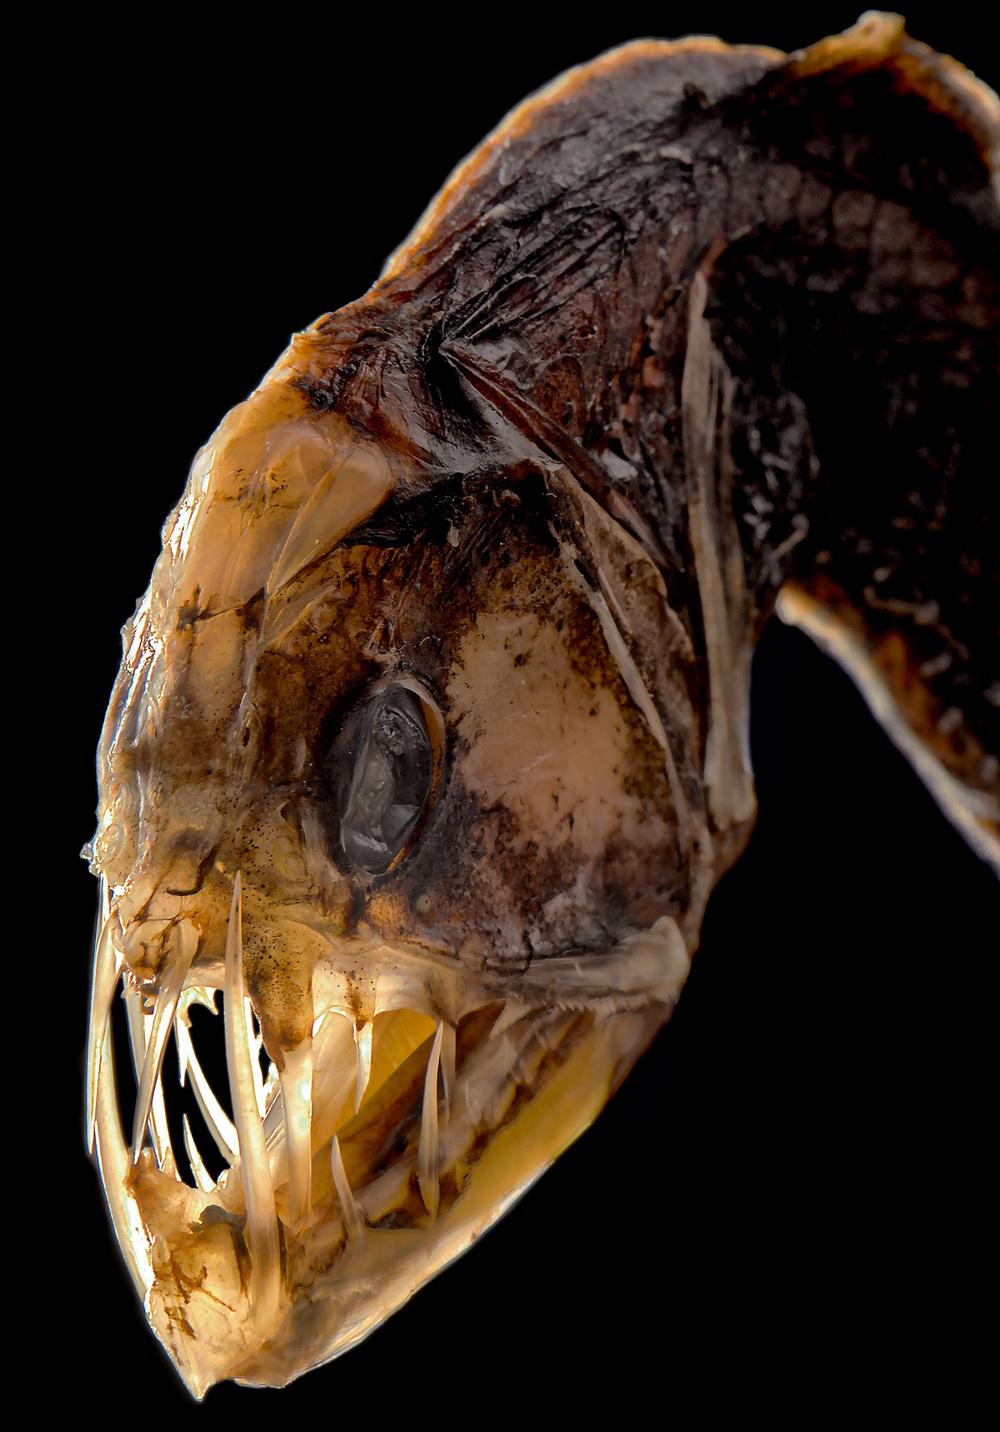 DragonfishSmall2.jpg